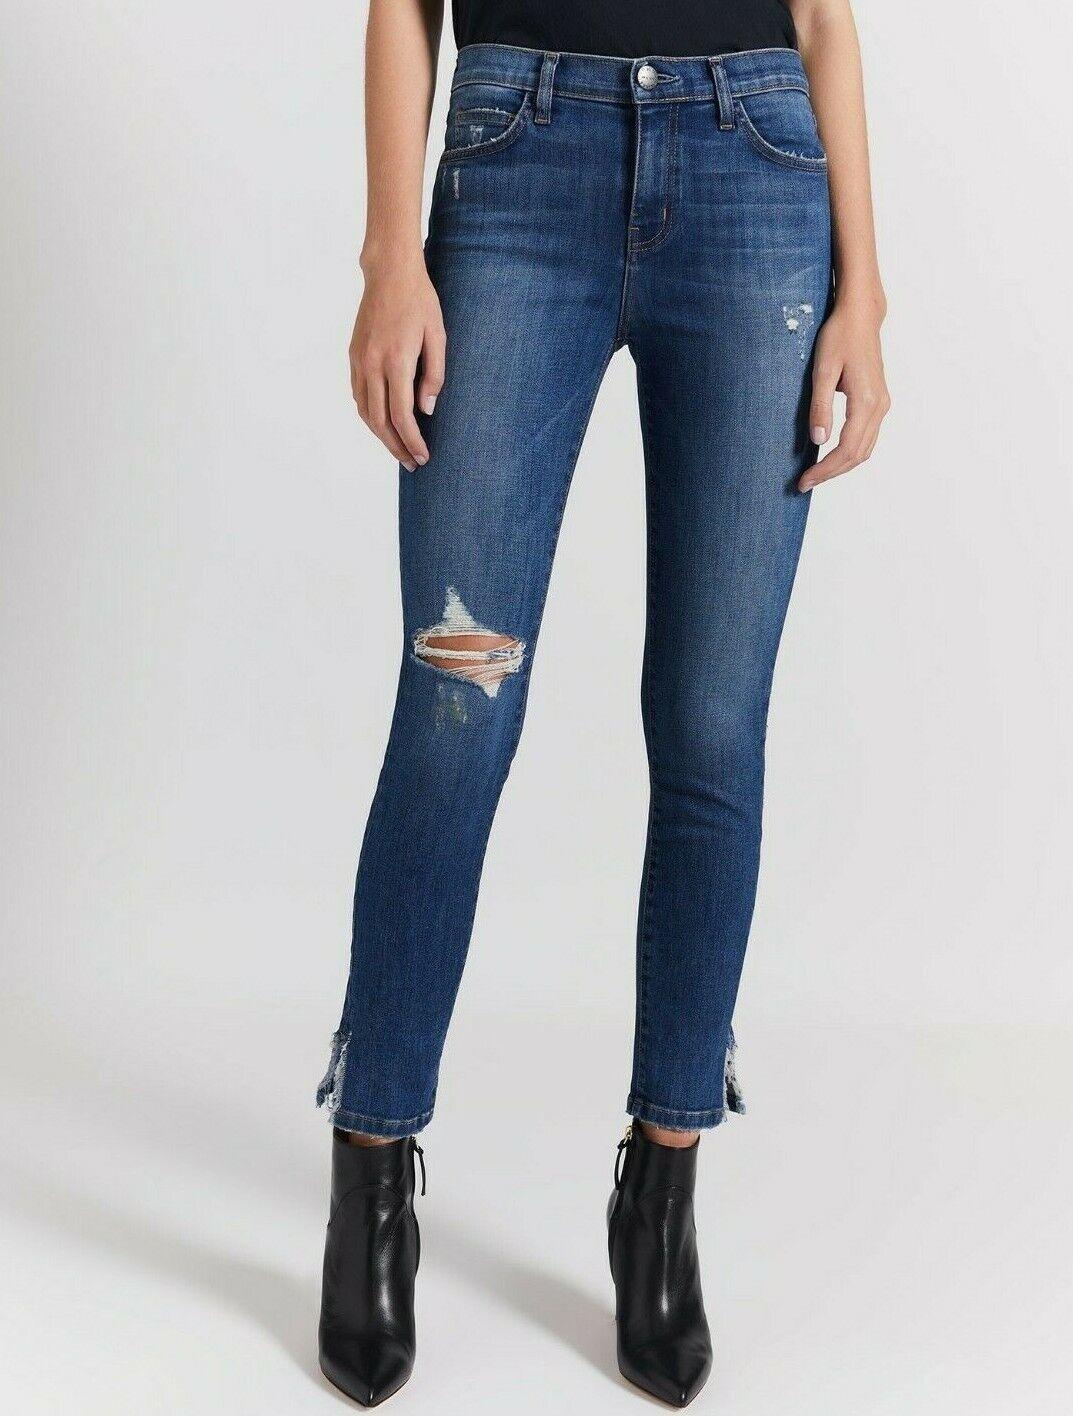 218  Nuevo con Etiqueta Current Elliott Sz26 la Aguja Midrise Skinny Jeans